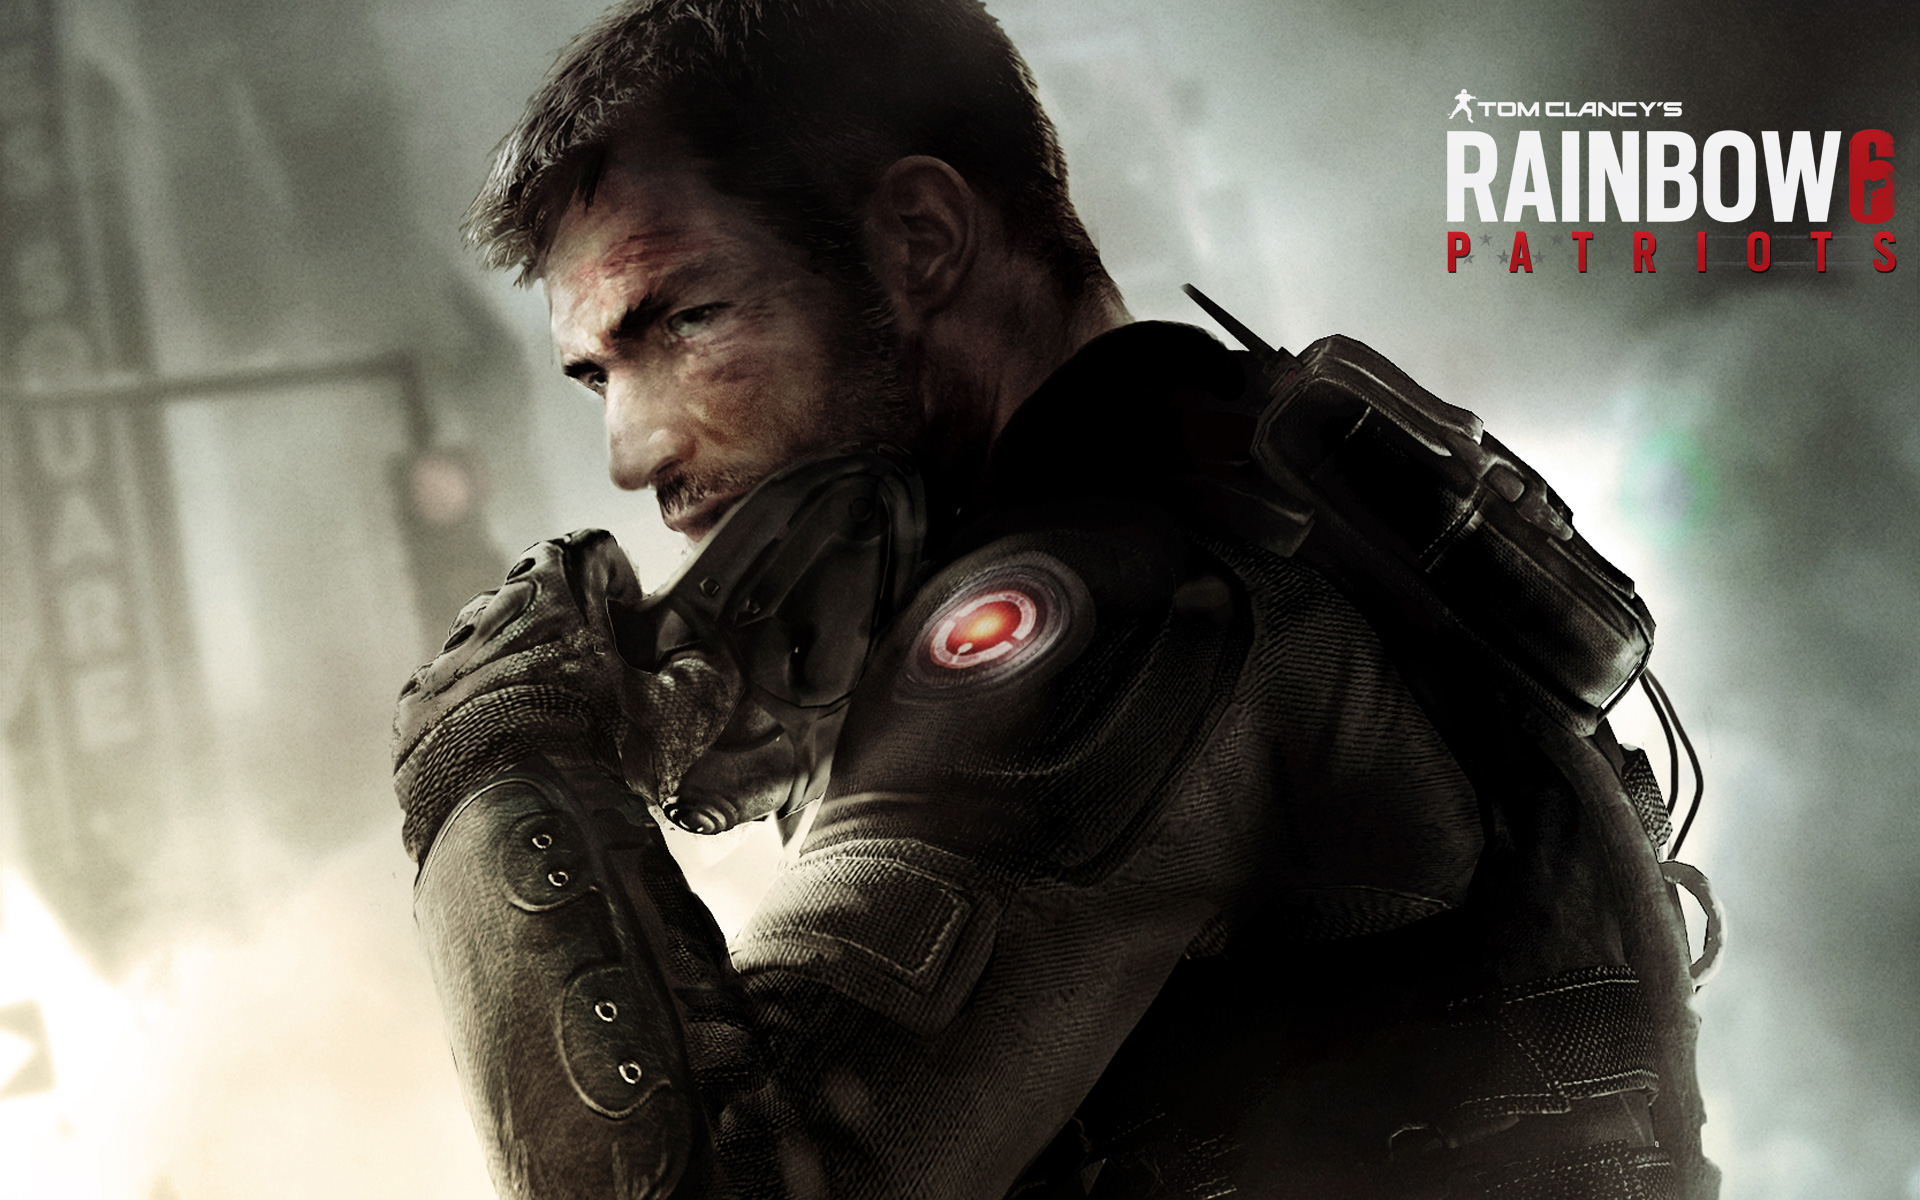 Tom Clancy's Rainbow 6: Patriots HD Wallpaper